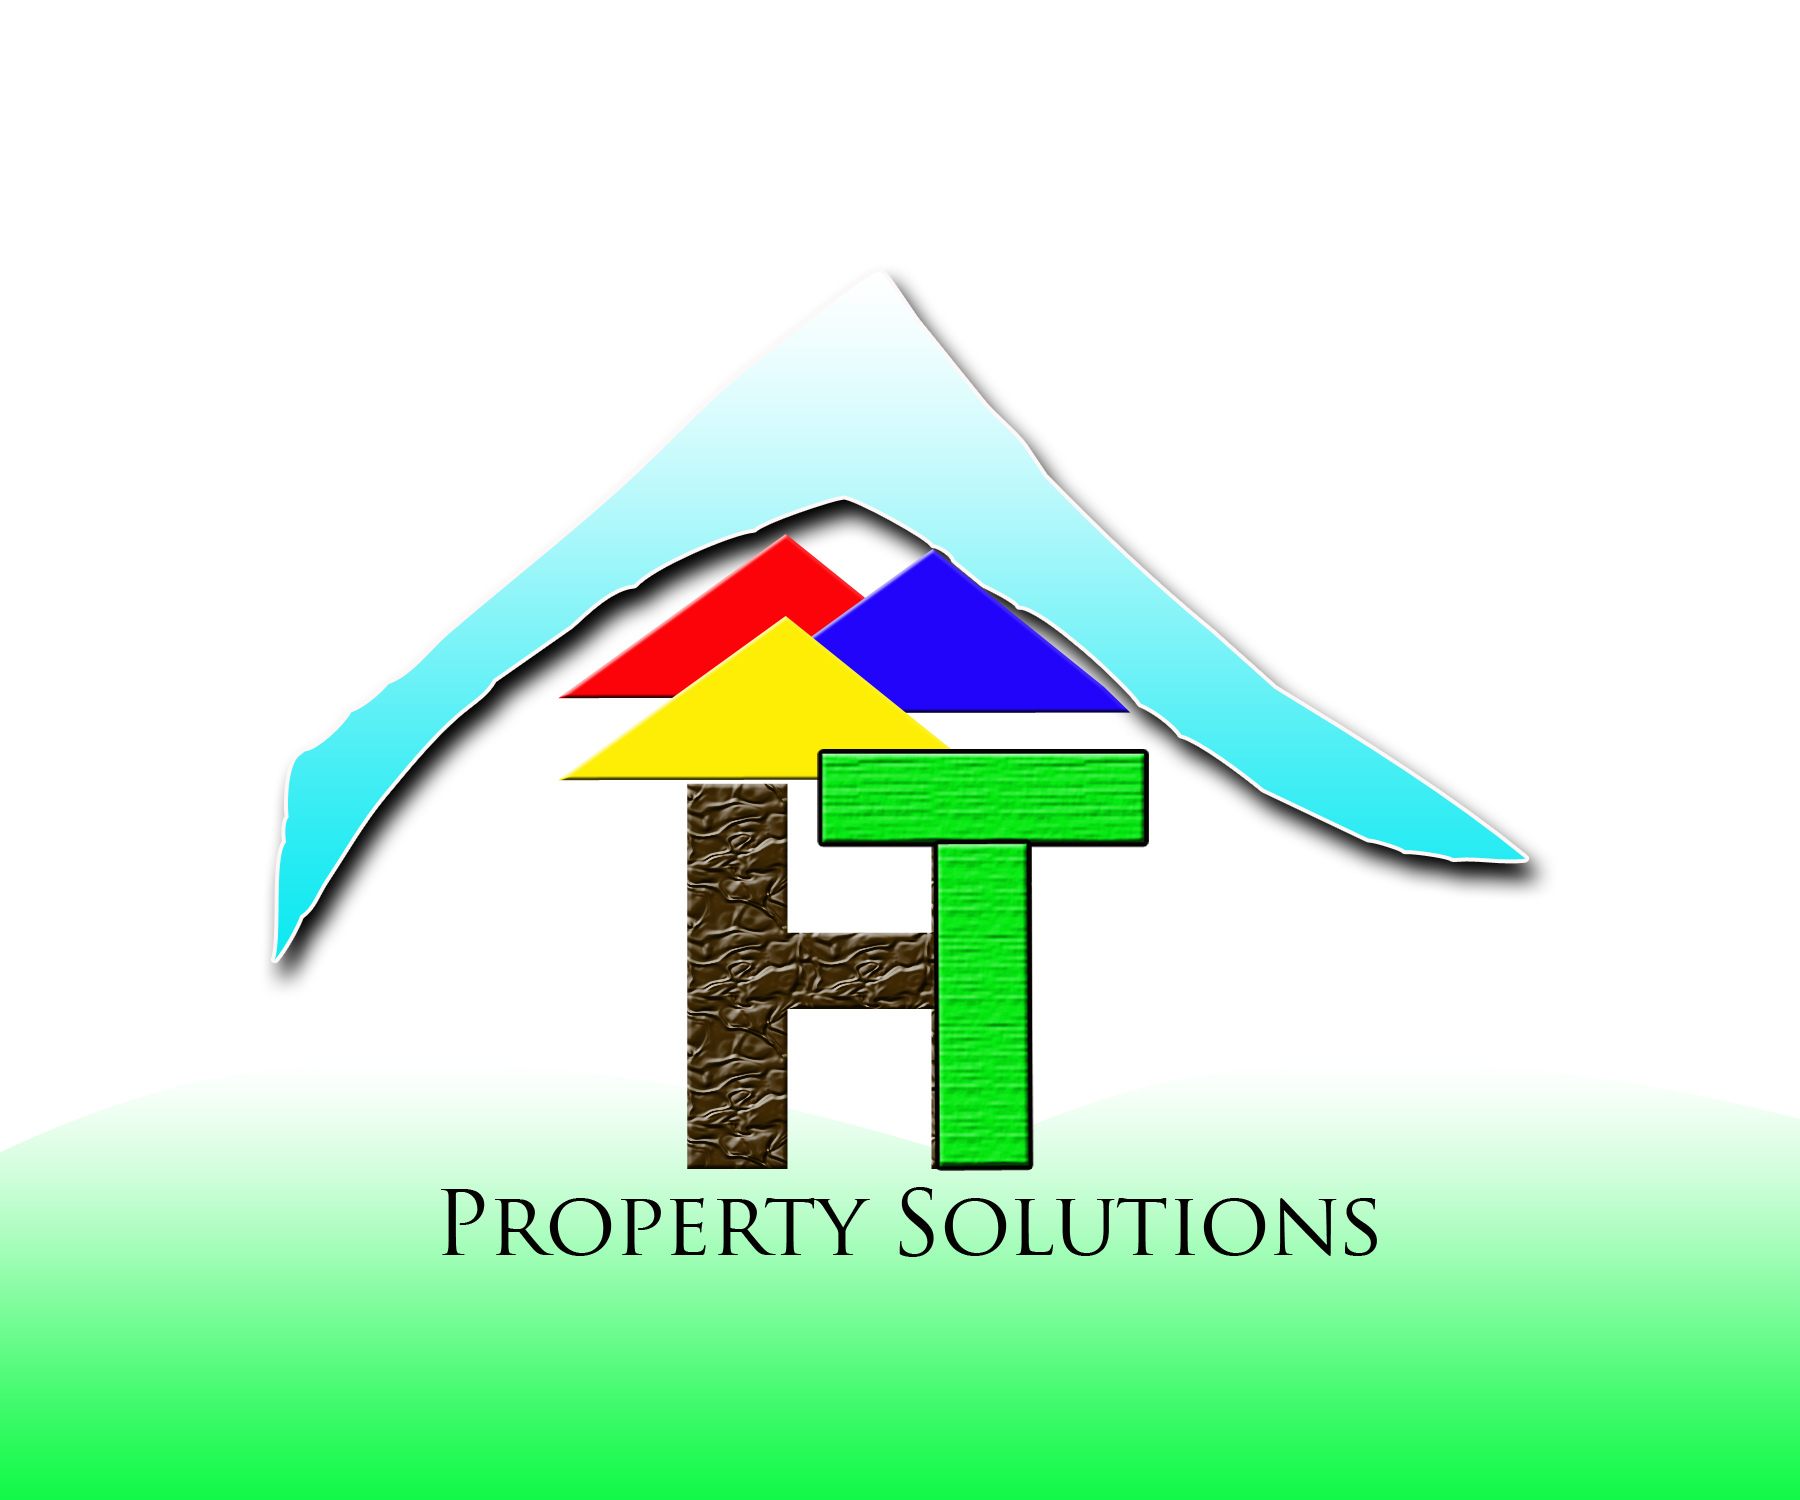 Logo Design by Jade Vinas - Entry No. 17 in the Logo Design Contest Imaginative Logo Design for Hilltop Property Solutions.